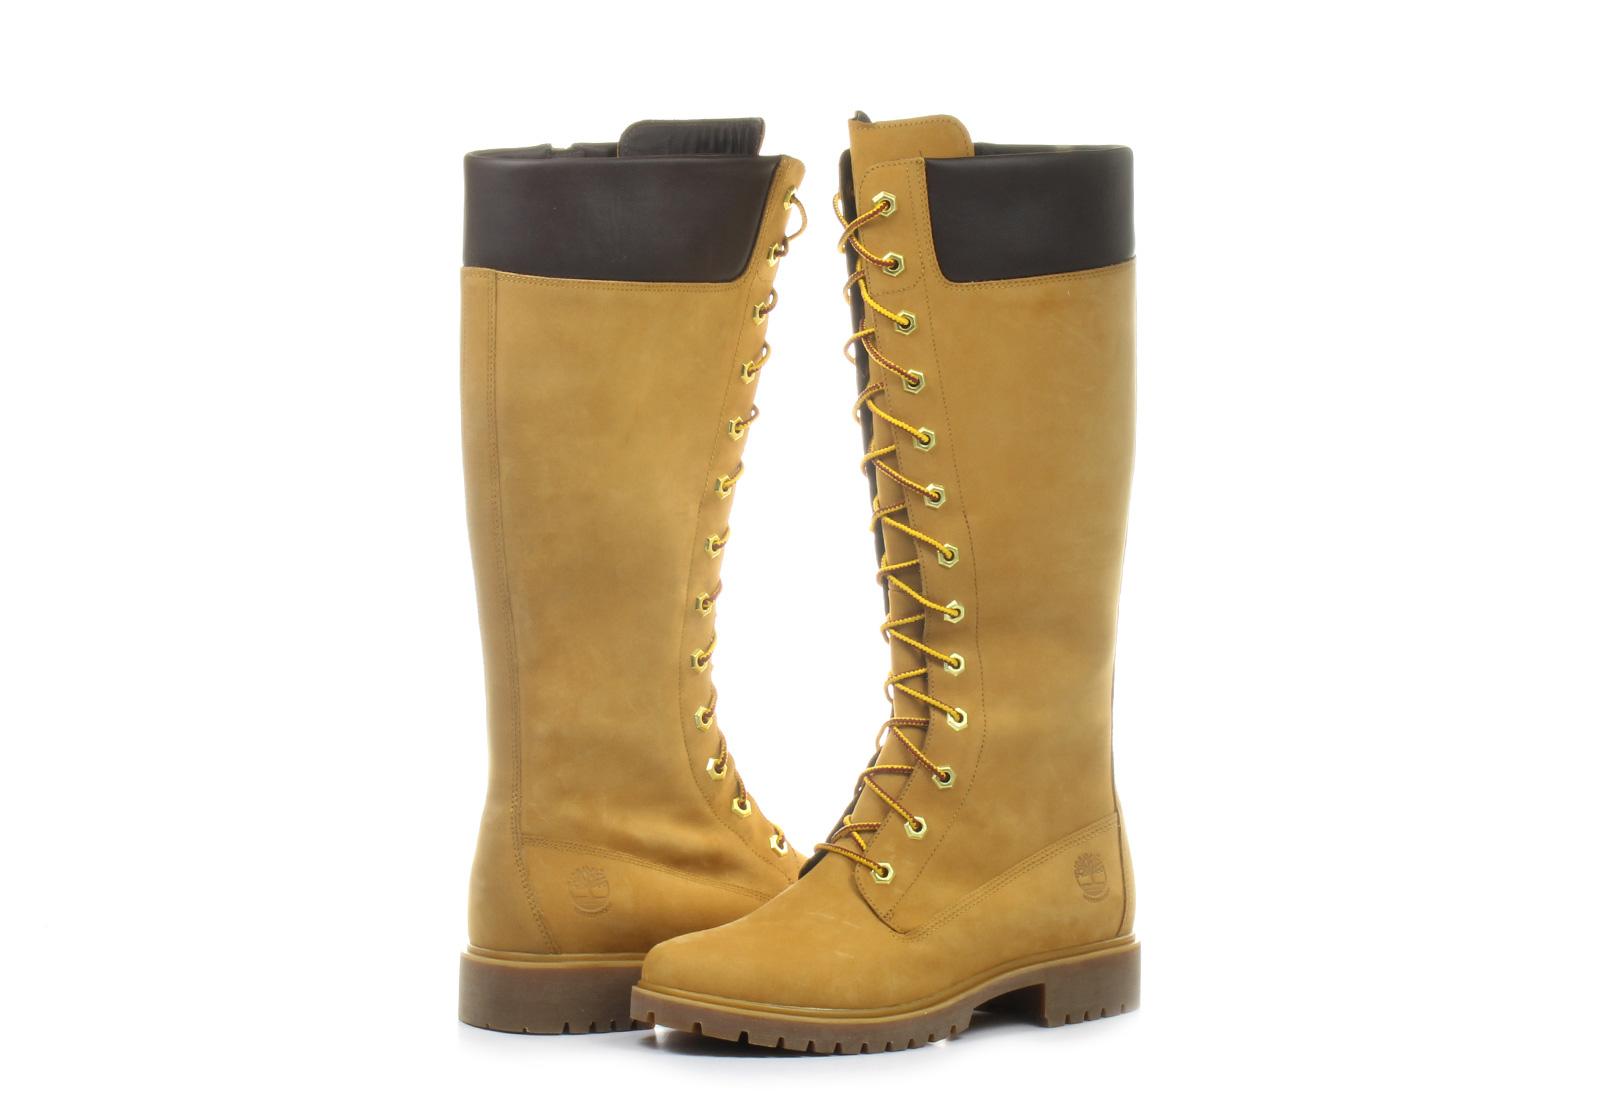 Timberland Čižmy - 14 In Premium Side Zip Boot - 8633a-whe ... 083f185c9c9